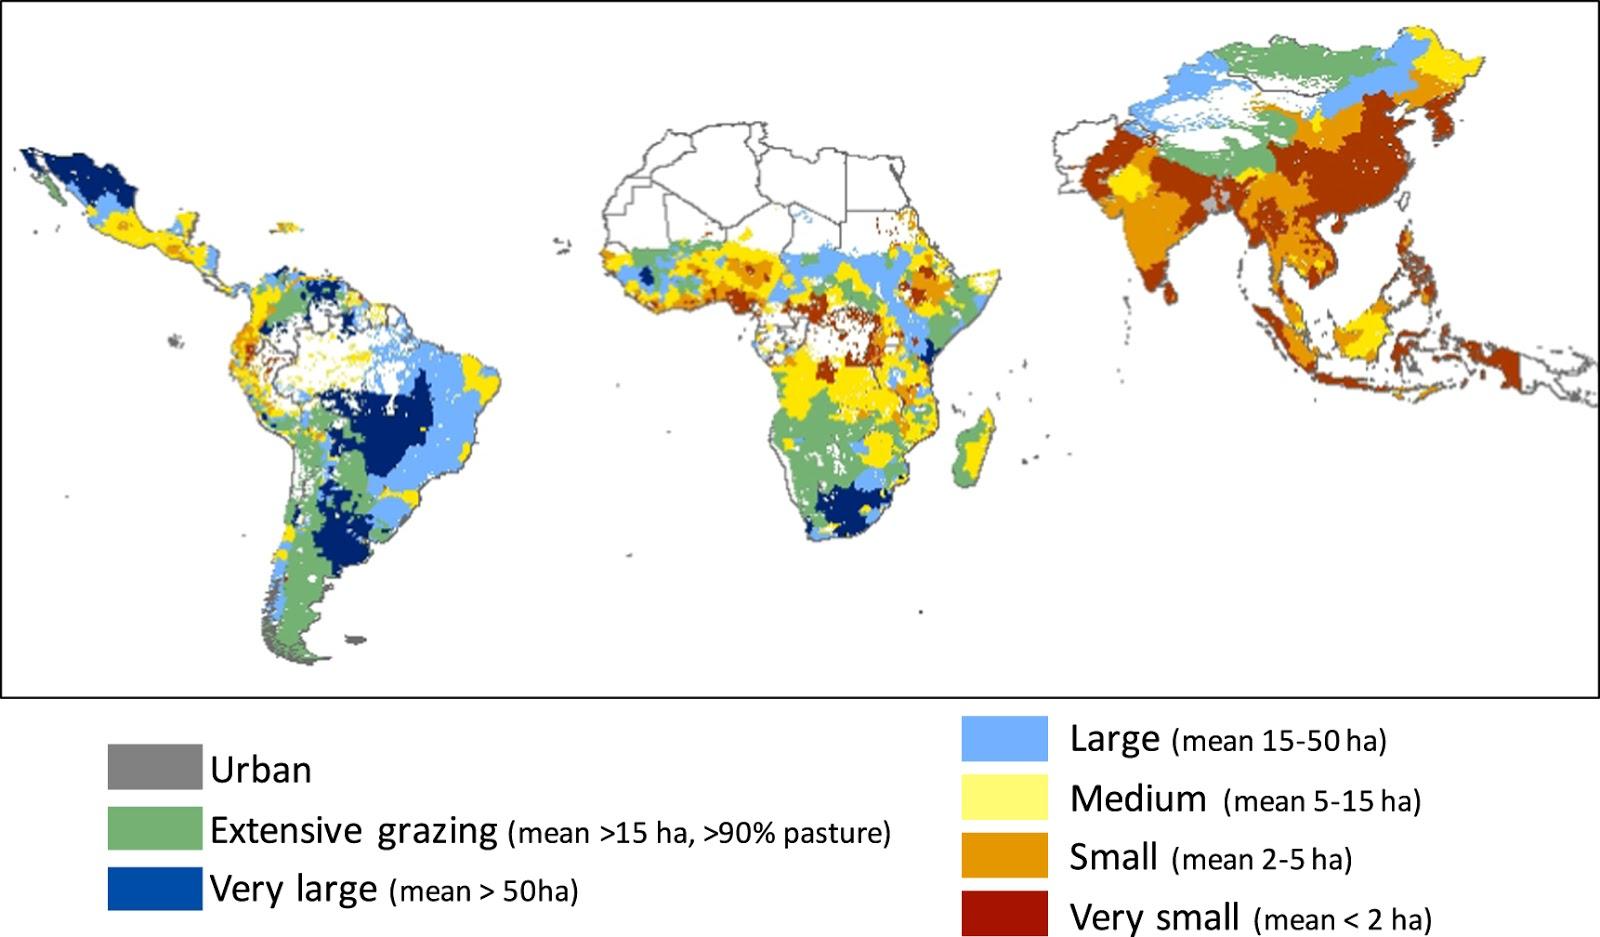 Mean farm size across world